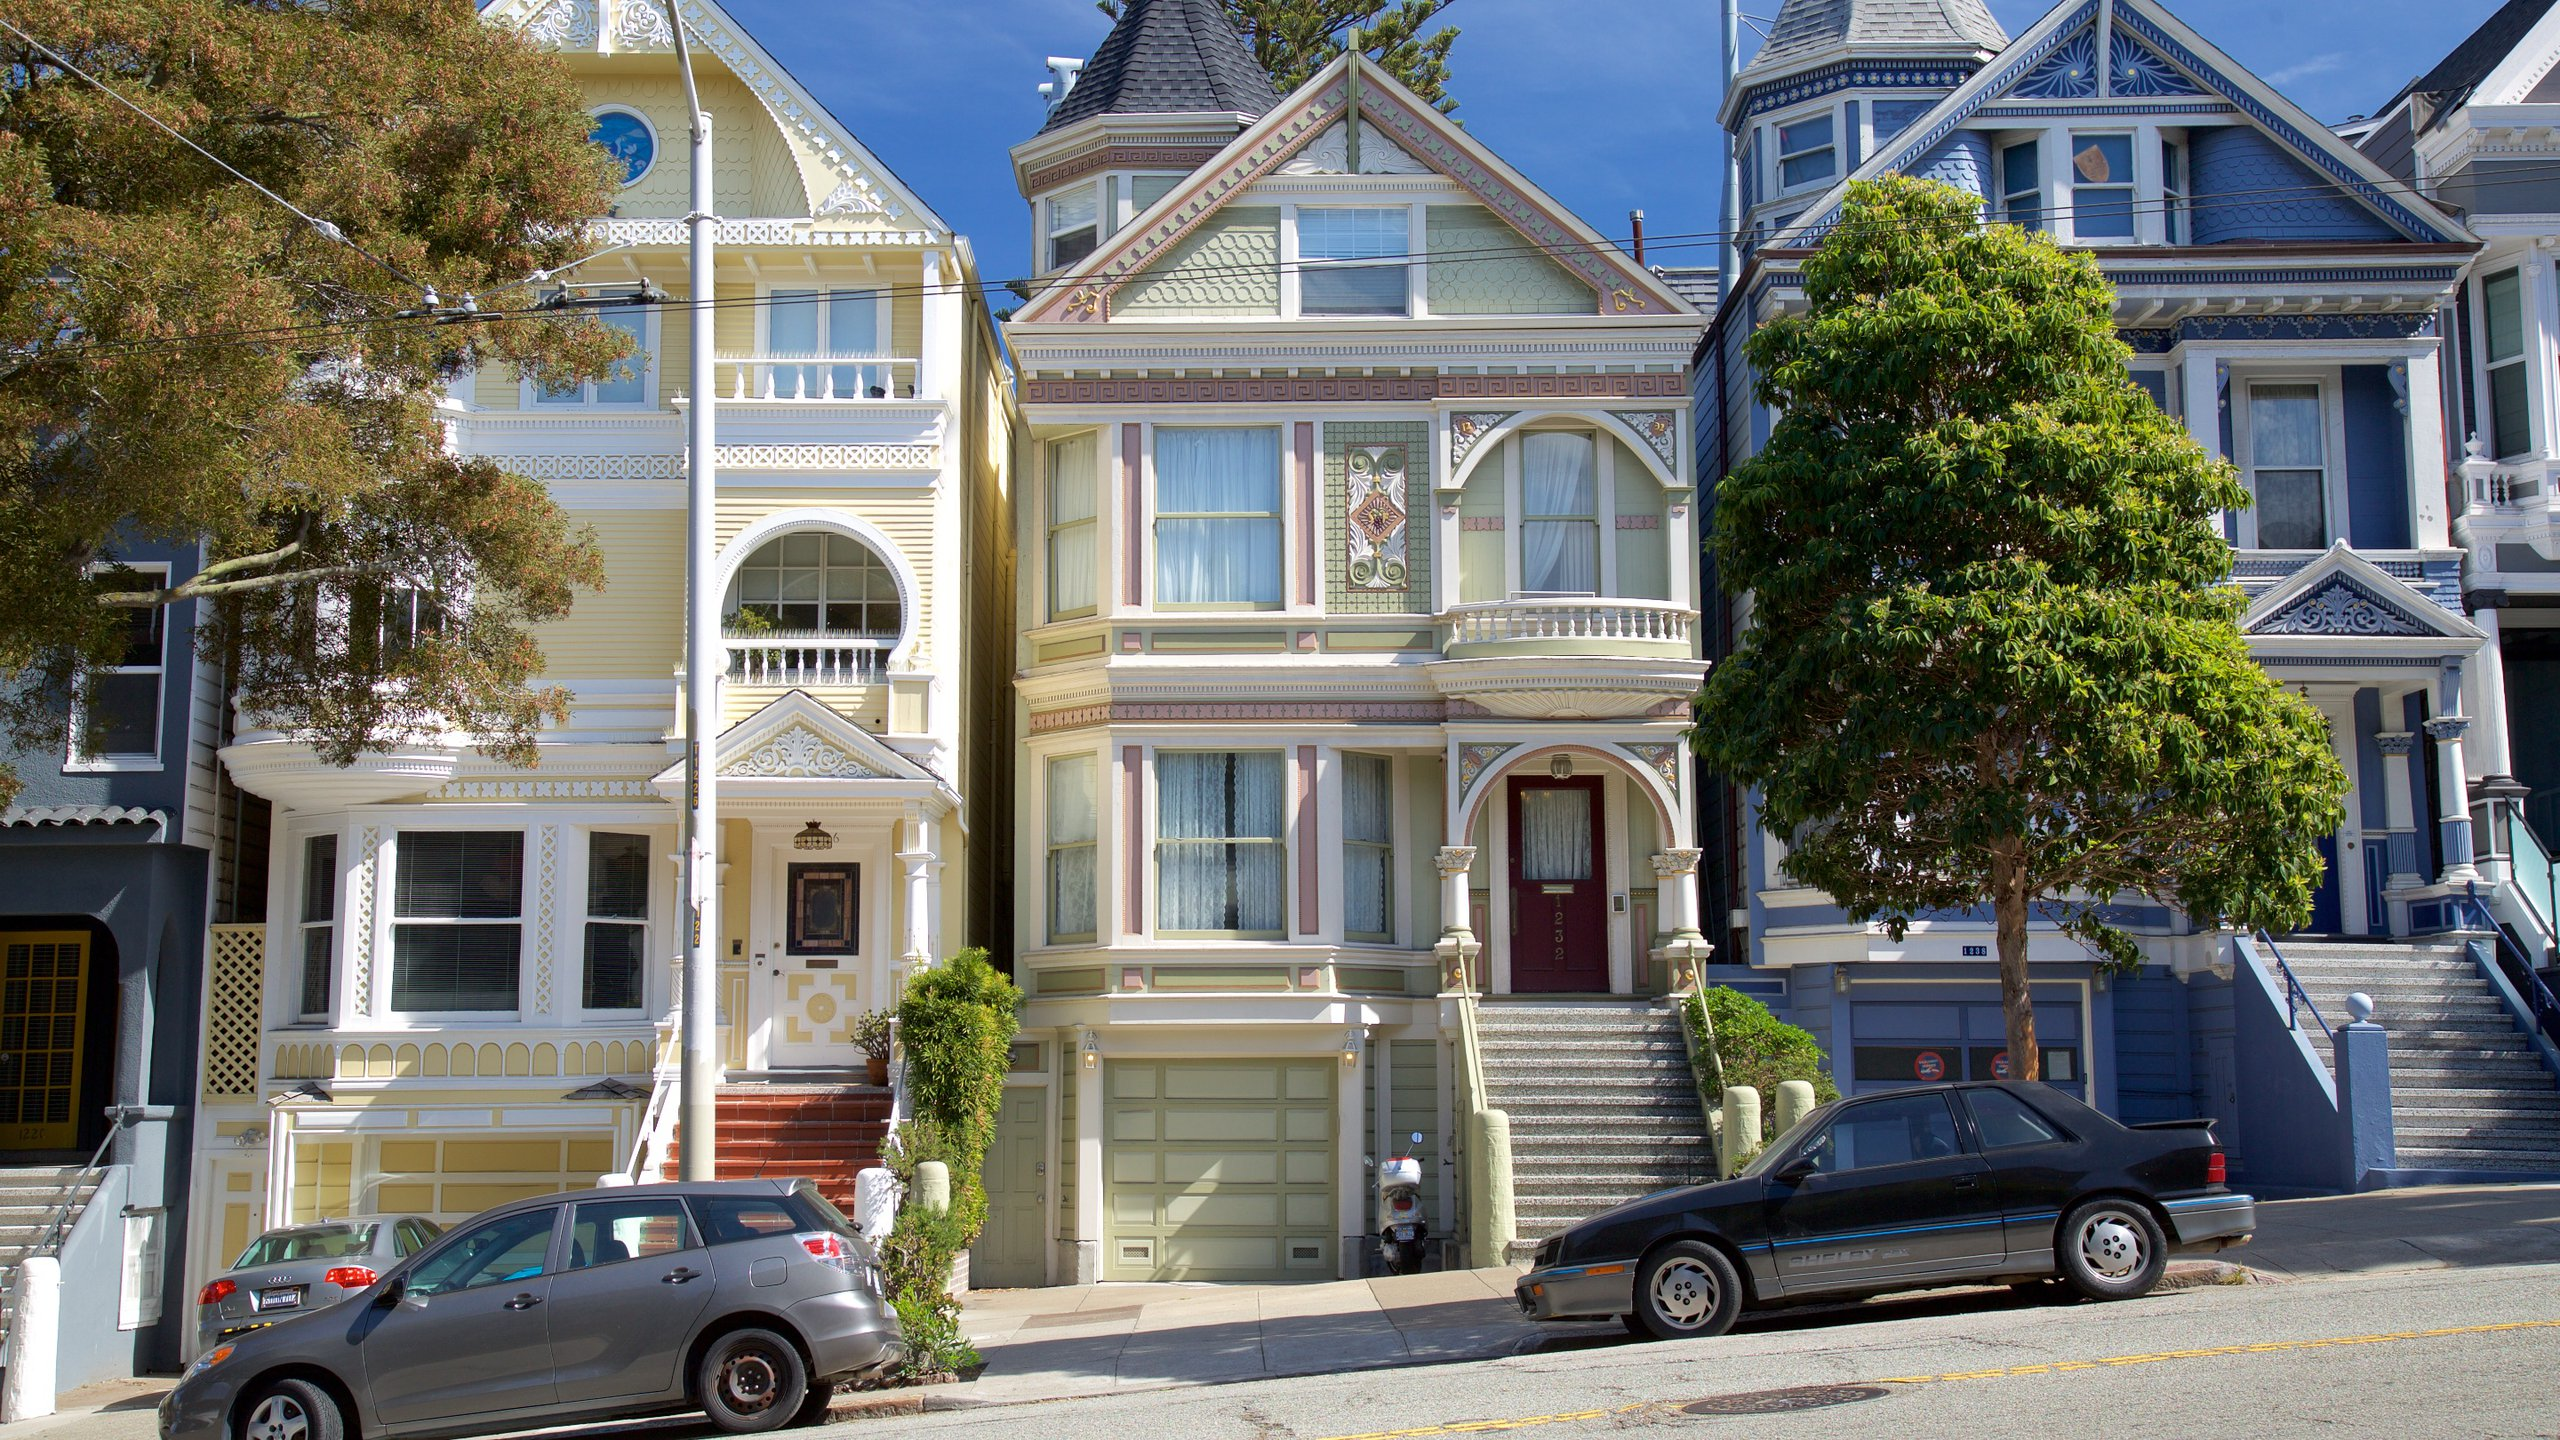 Haight-Ashbury, San Francisco, California, United States of America